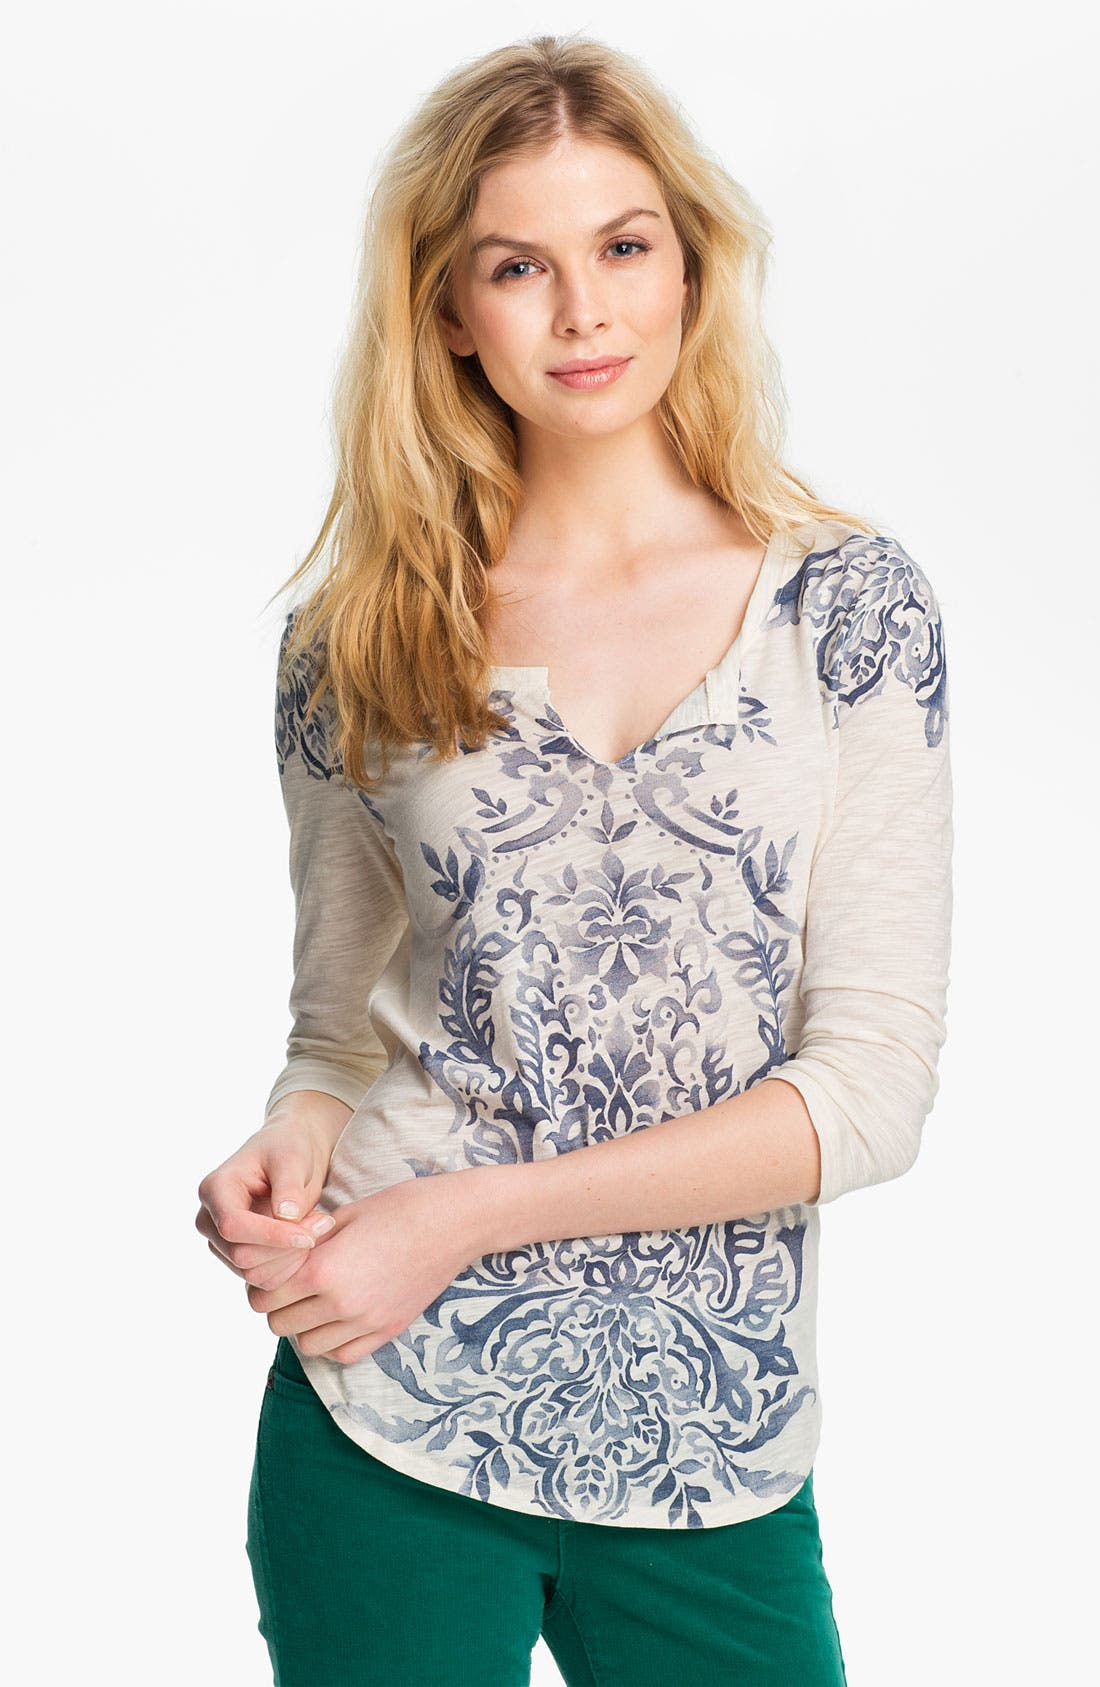 Main Image - Lucky Brand 'Riad Motif' Tee